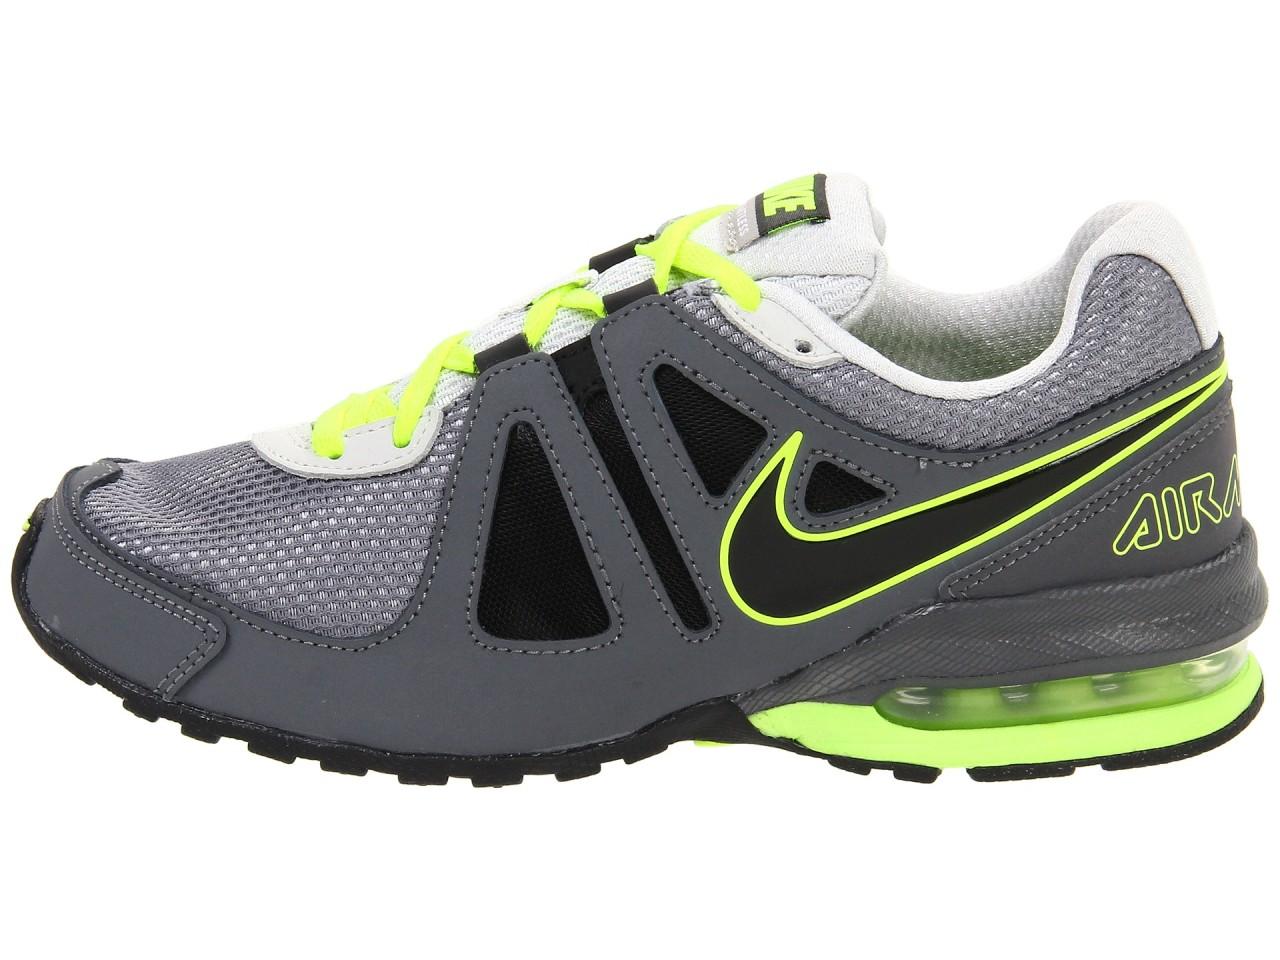 Nike Mens Air Max Limitless Running Shoes Cool Grey/Black Dark Grey